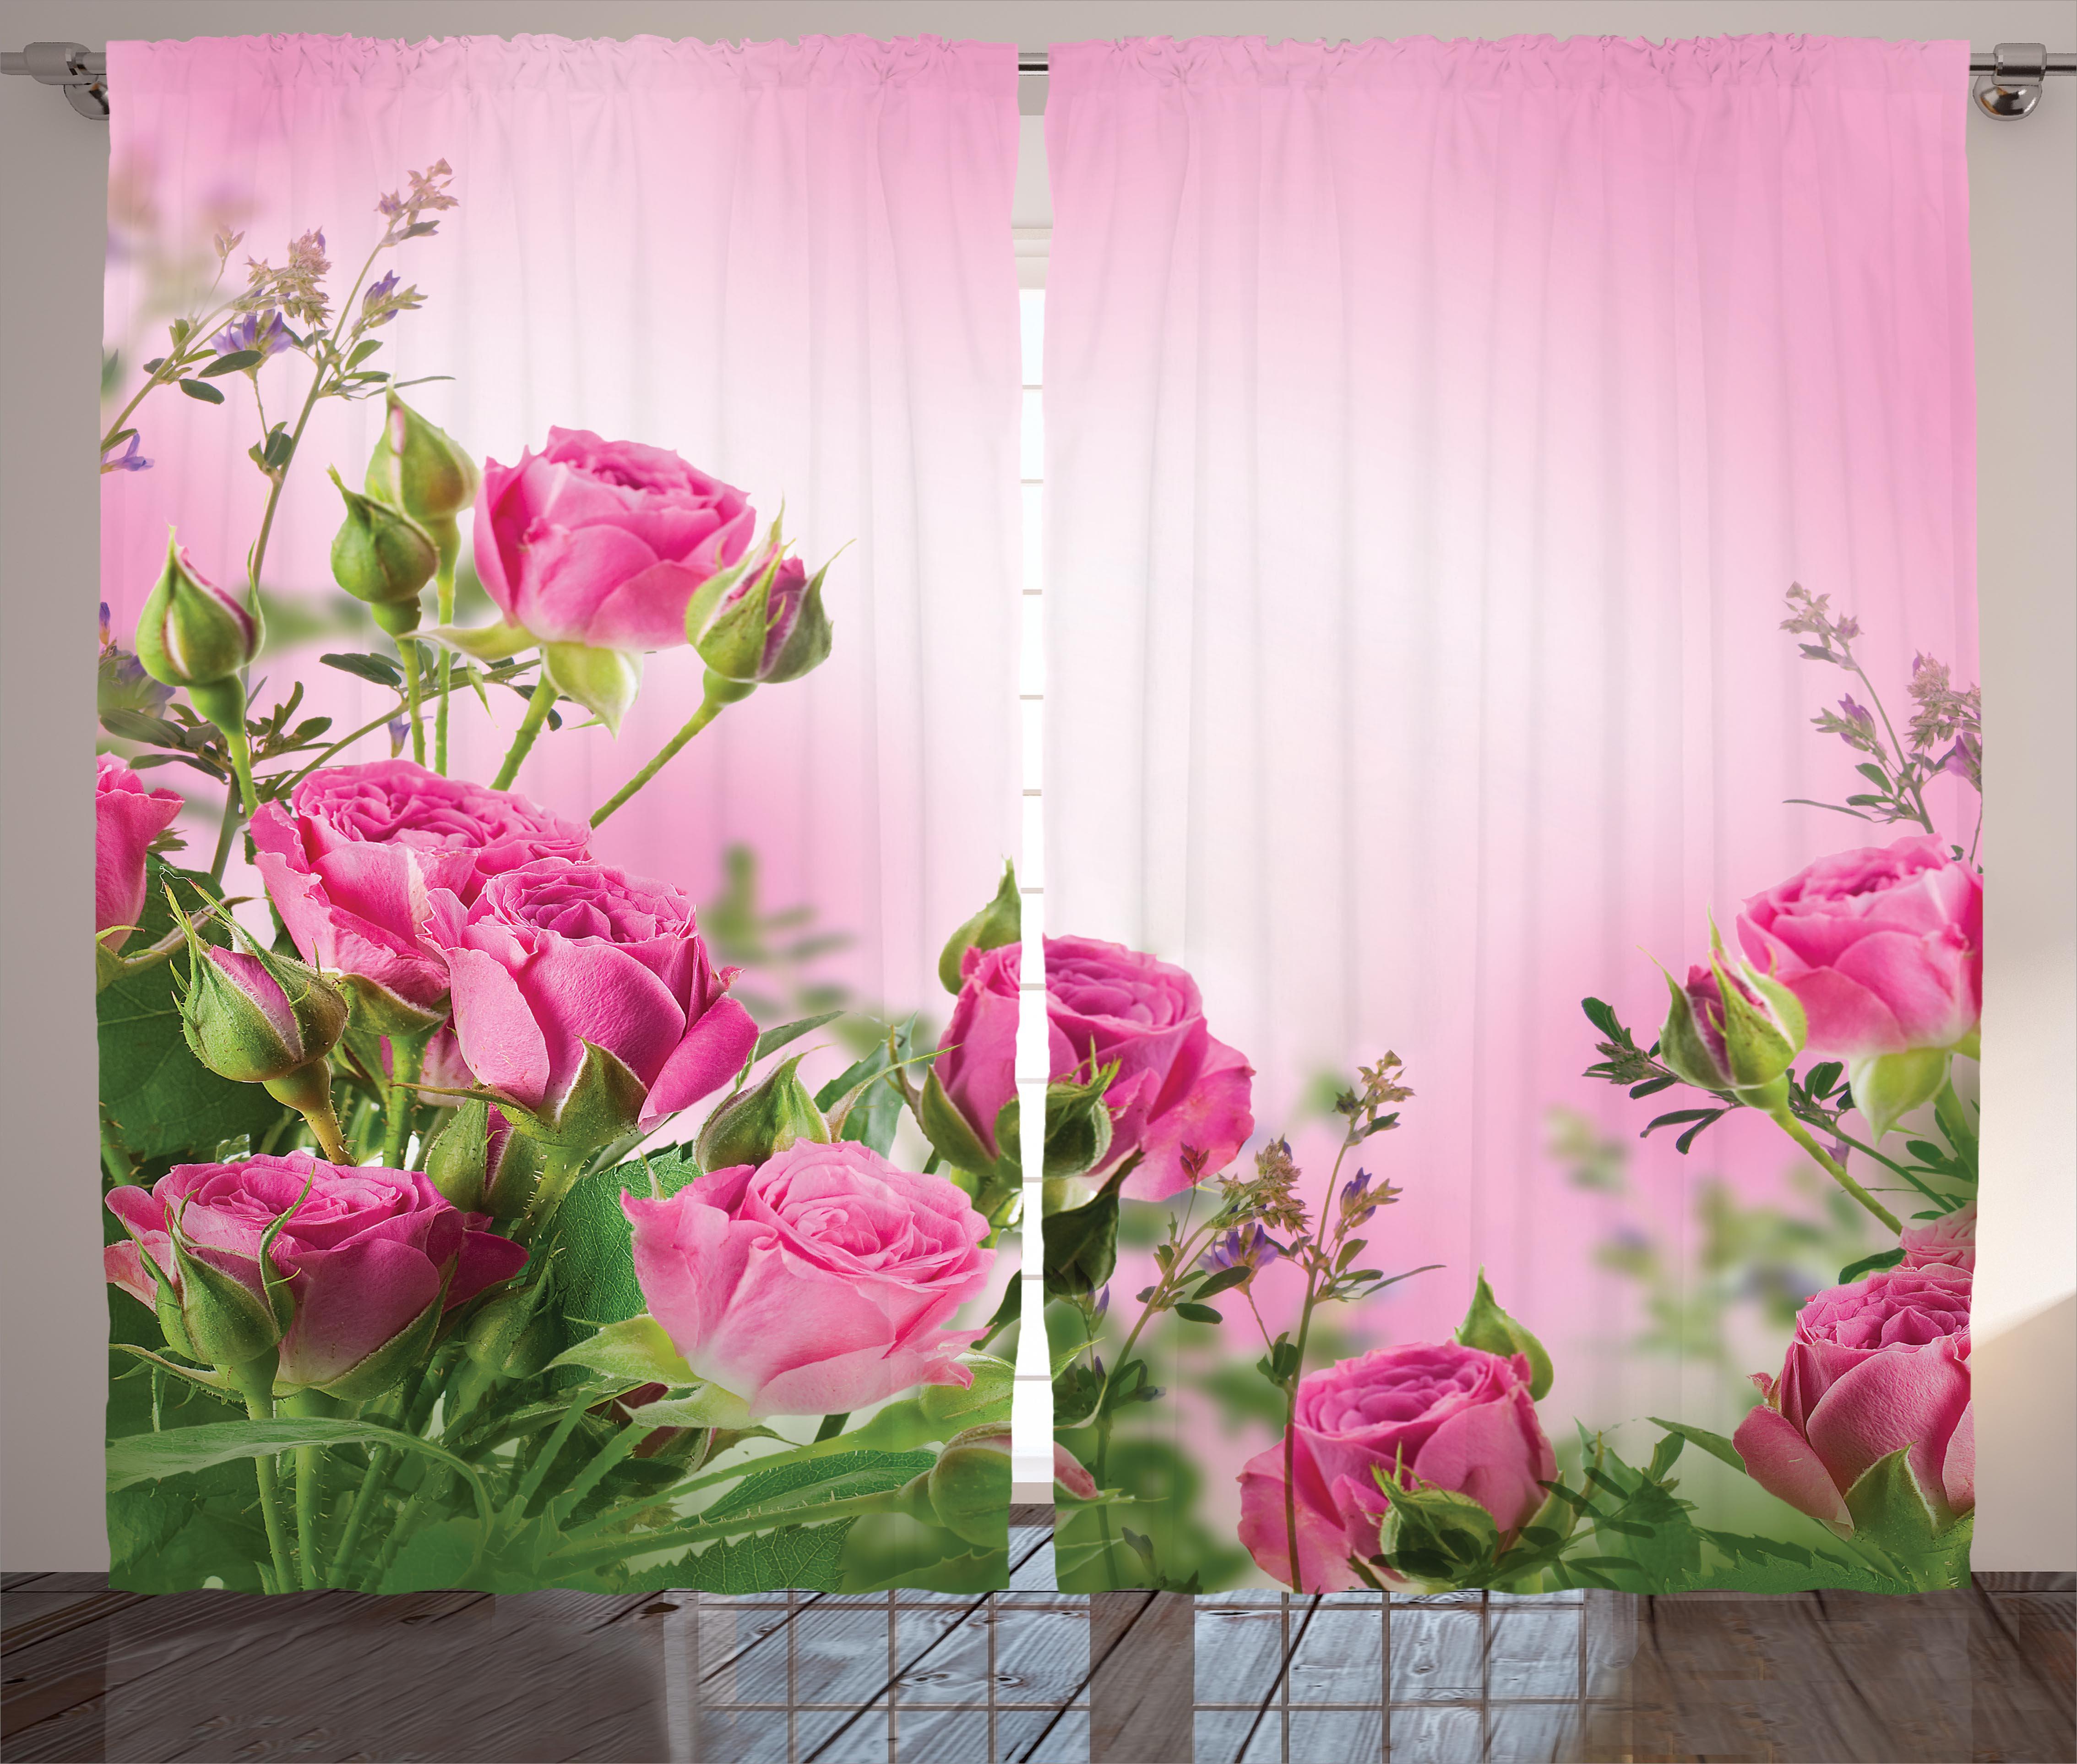 Red Barrel Studio Turner Flower Graphic Print And Text Semi Sheer Rod Pocket Curtain Panels Wayfair